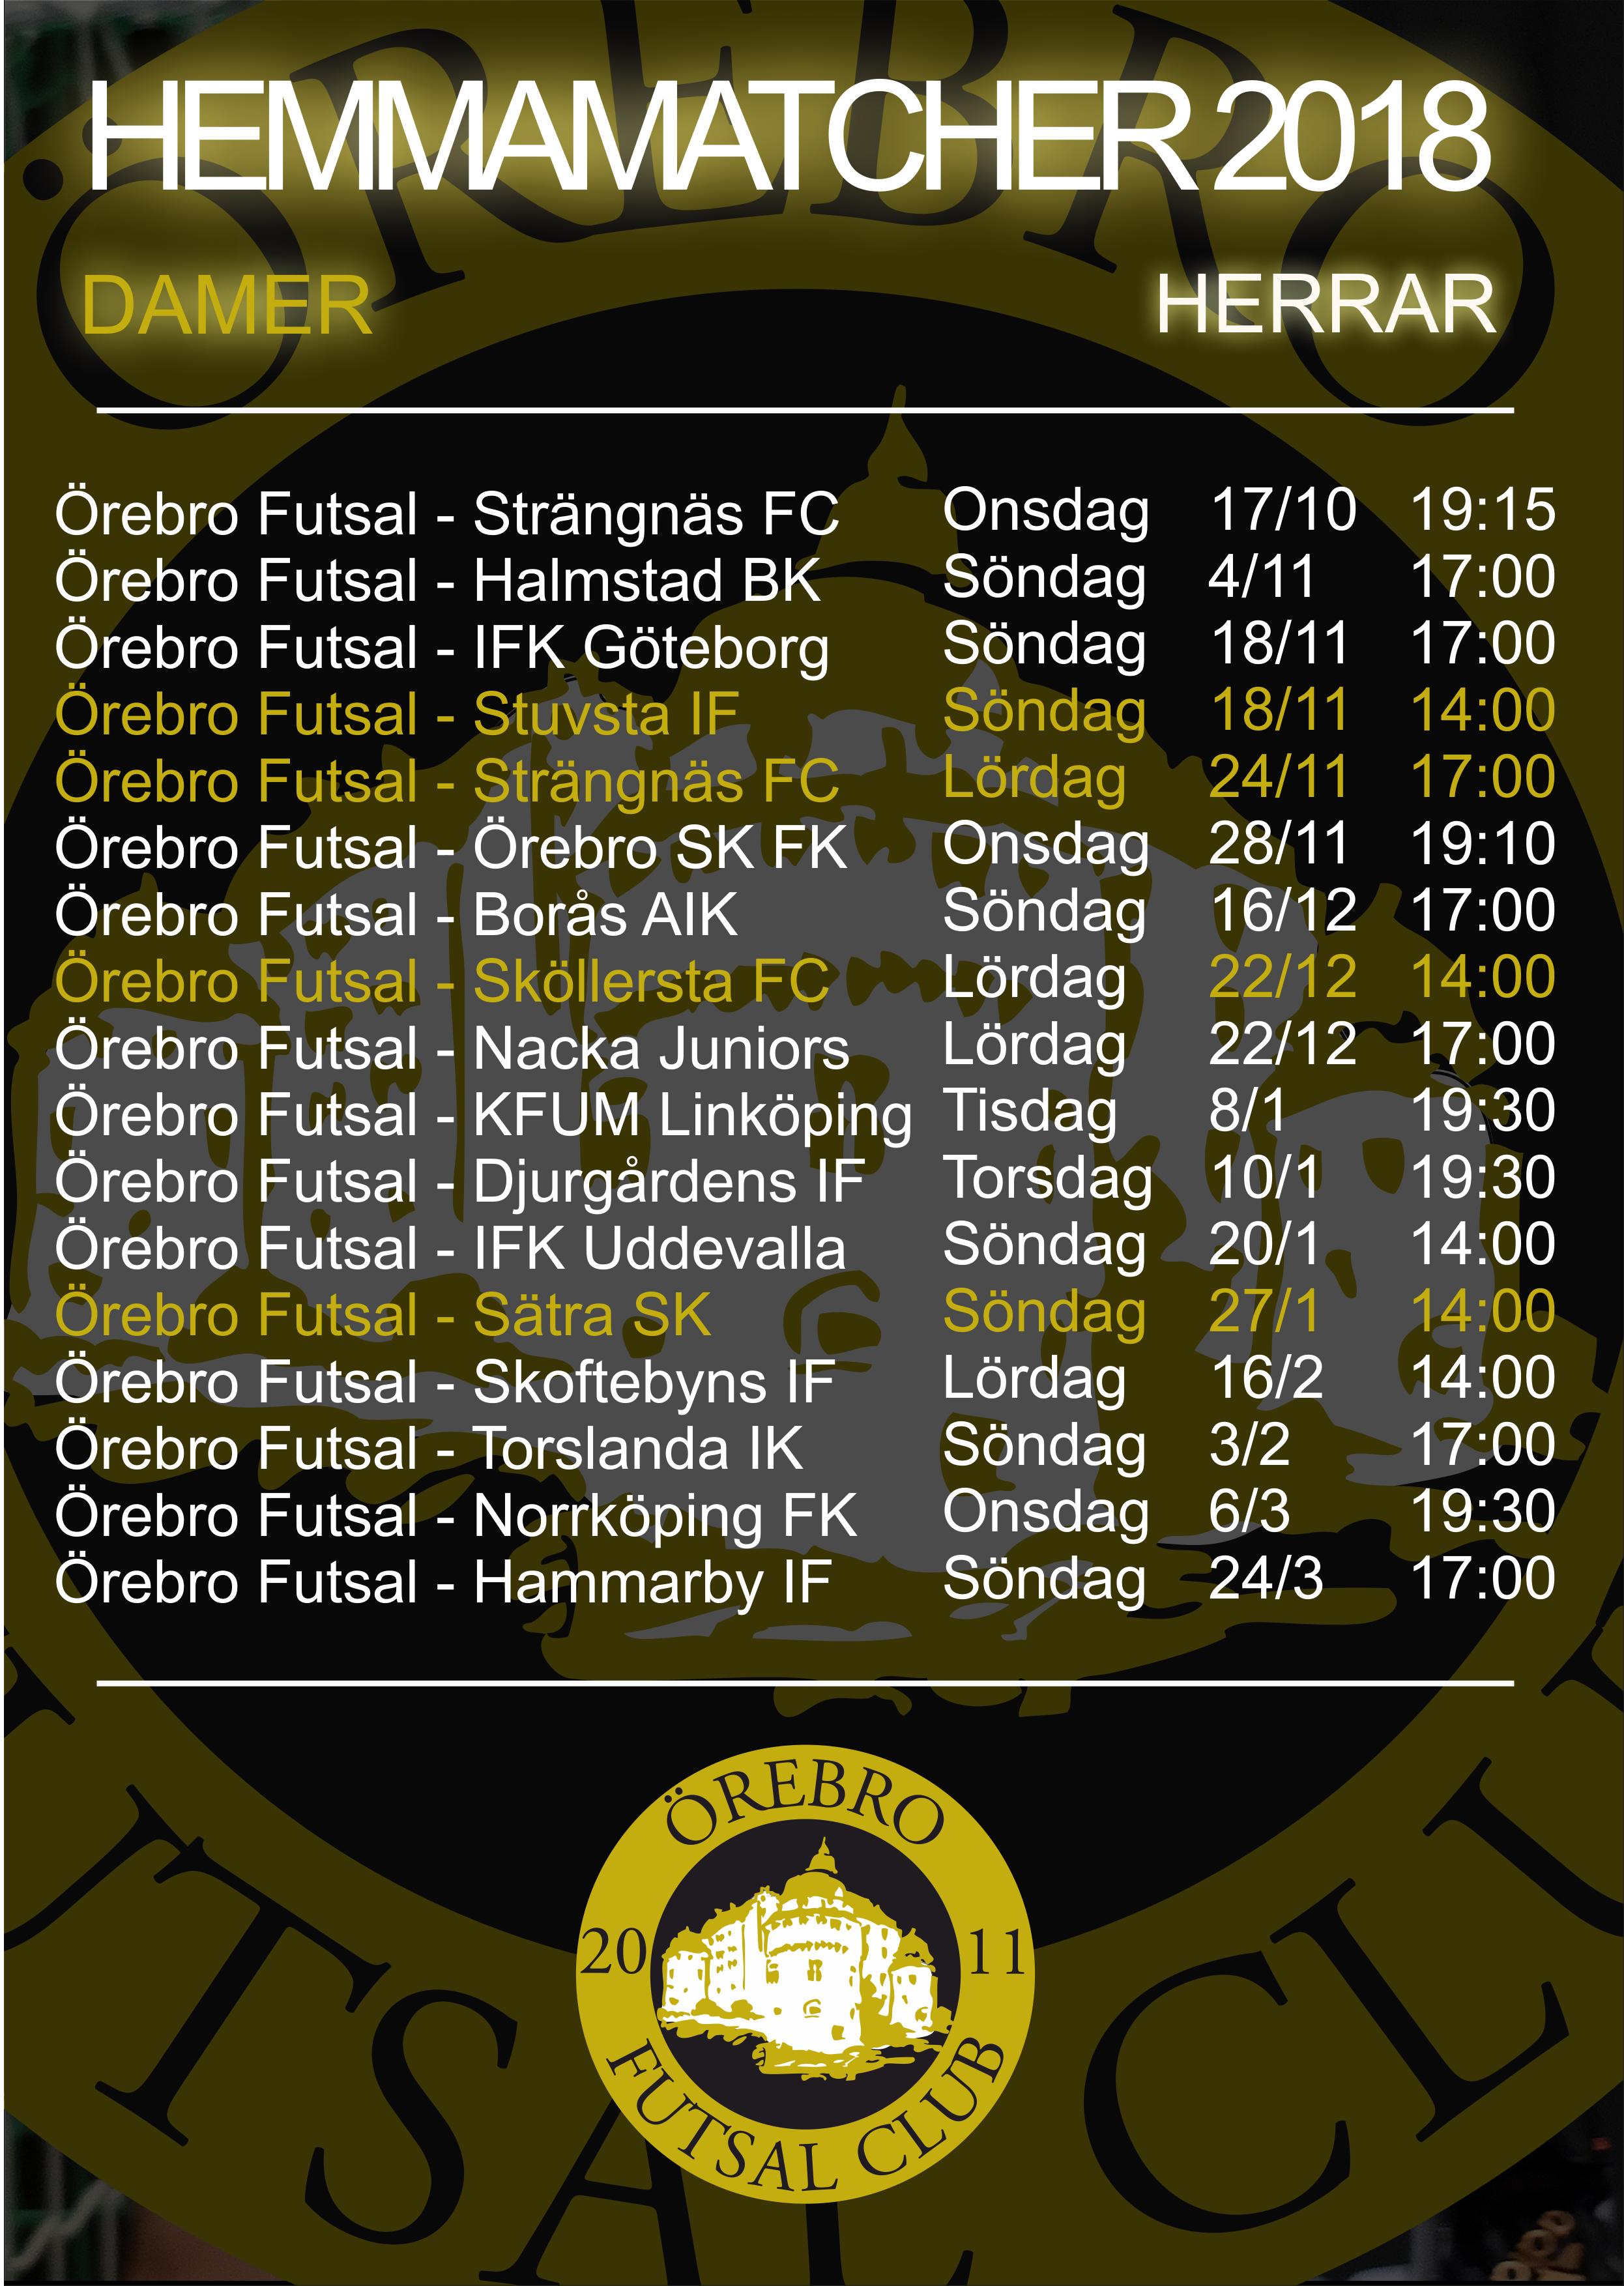 Örebro Futsal Club - Spelschema